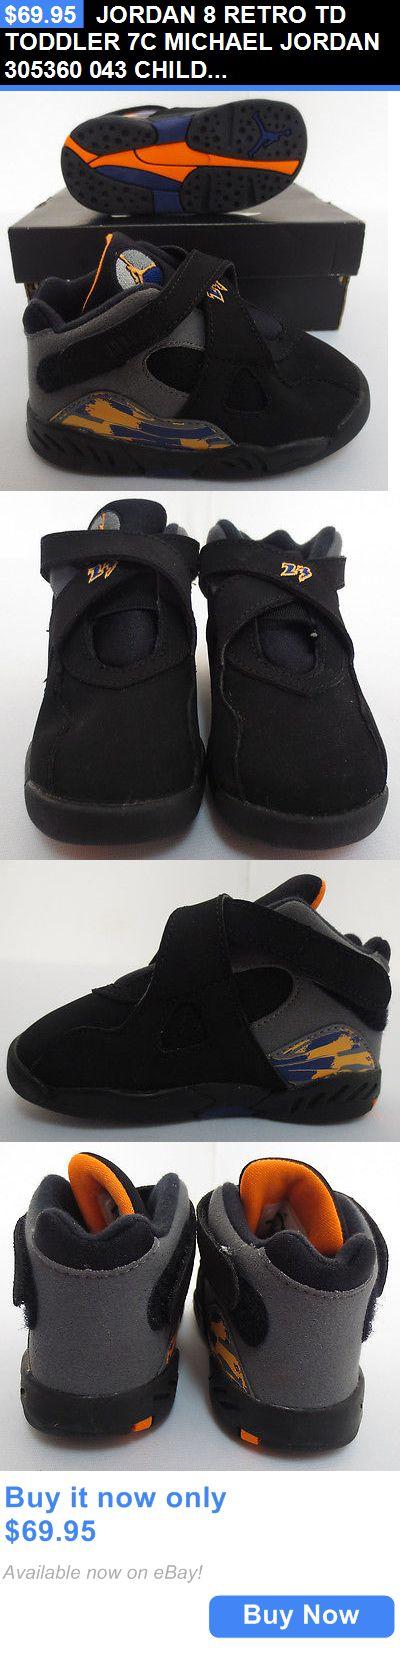 Michael Jordan Baby Clothing: Jordan 8 Retro Td Toddler 7C Michael Jordan 305360 043 Child Shoes Phnx Suns New BUY IT NOW ONLY: $69.95